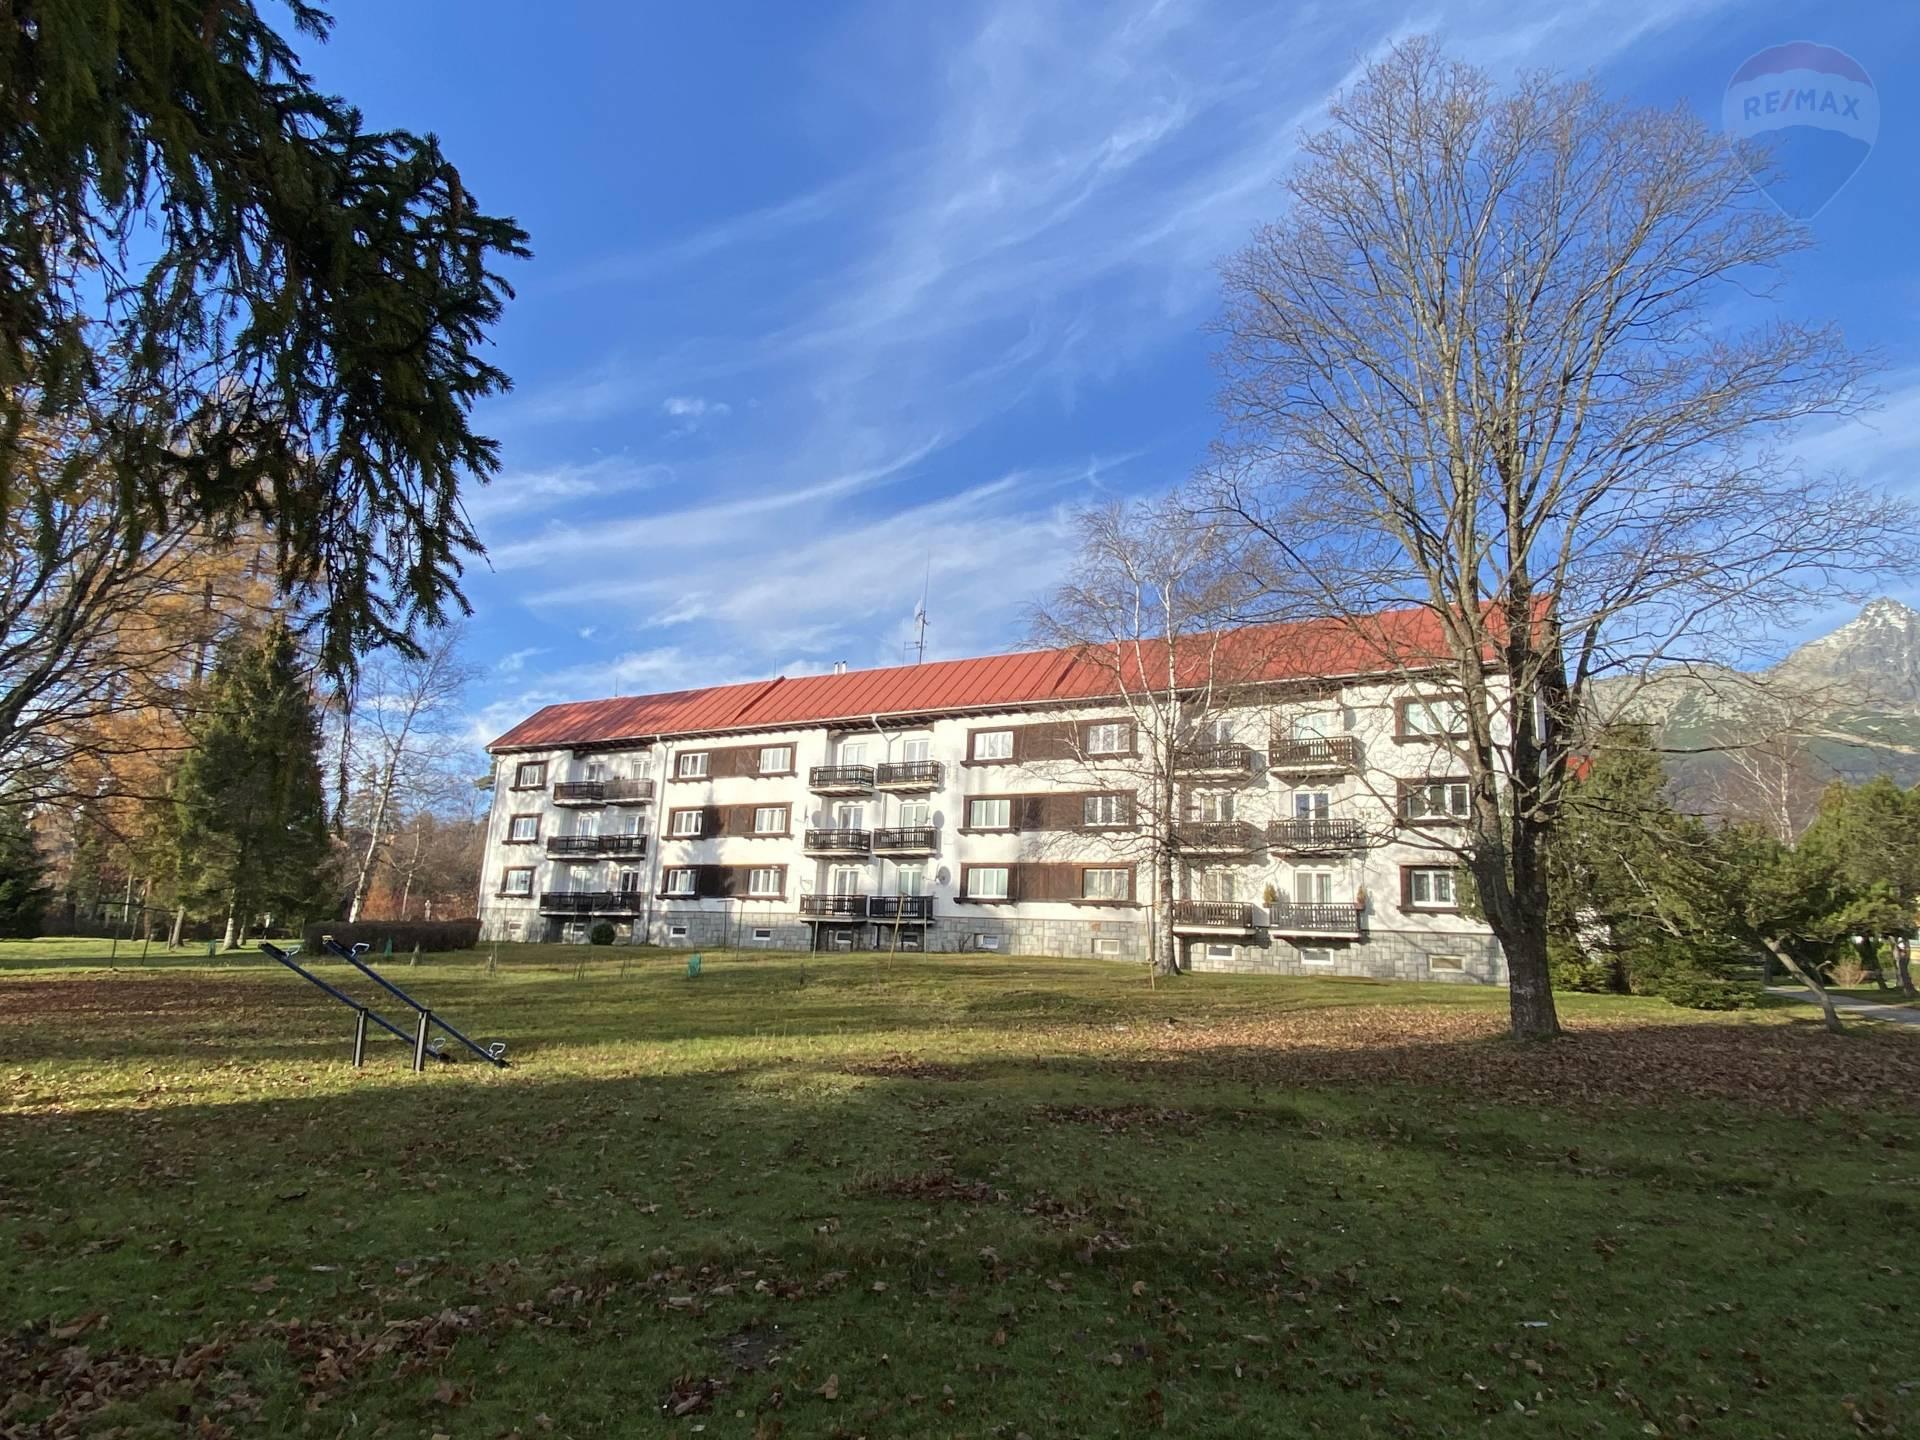 """Byt v Tatrách, v Tatranskej Lomnici"" Predaj 2-izb. byt, balkón, Vysoké Tatry, Tatranská Lomnica"